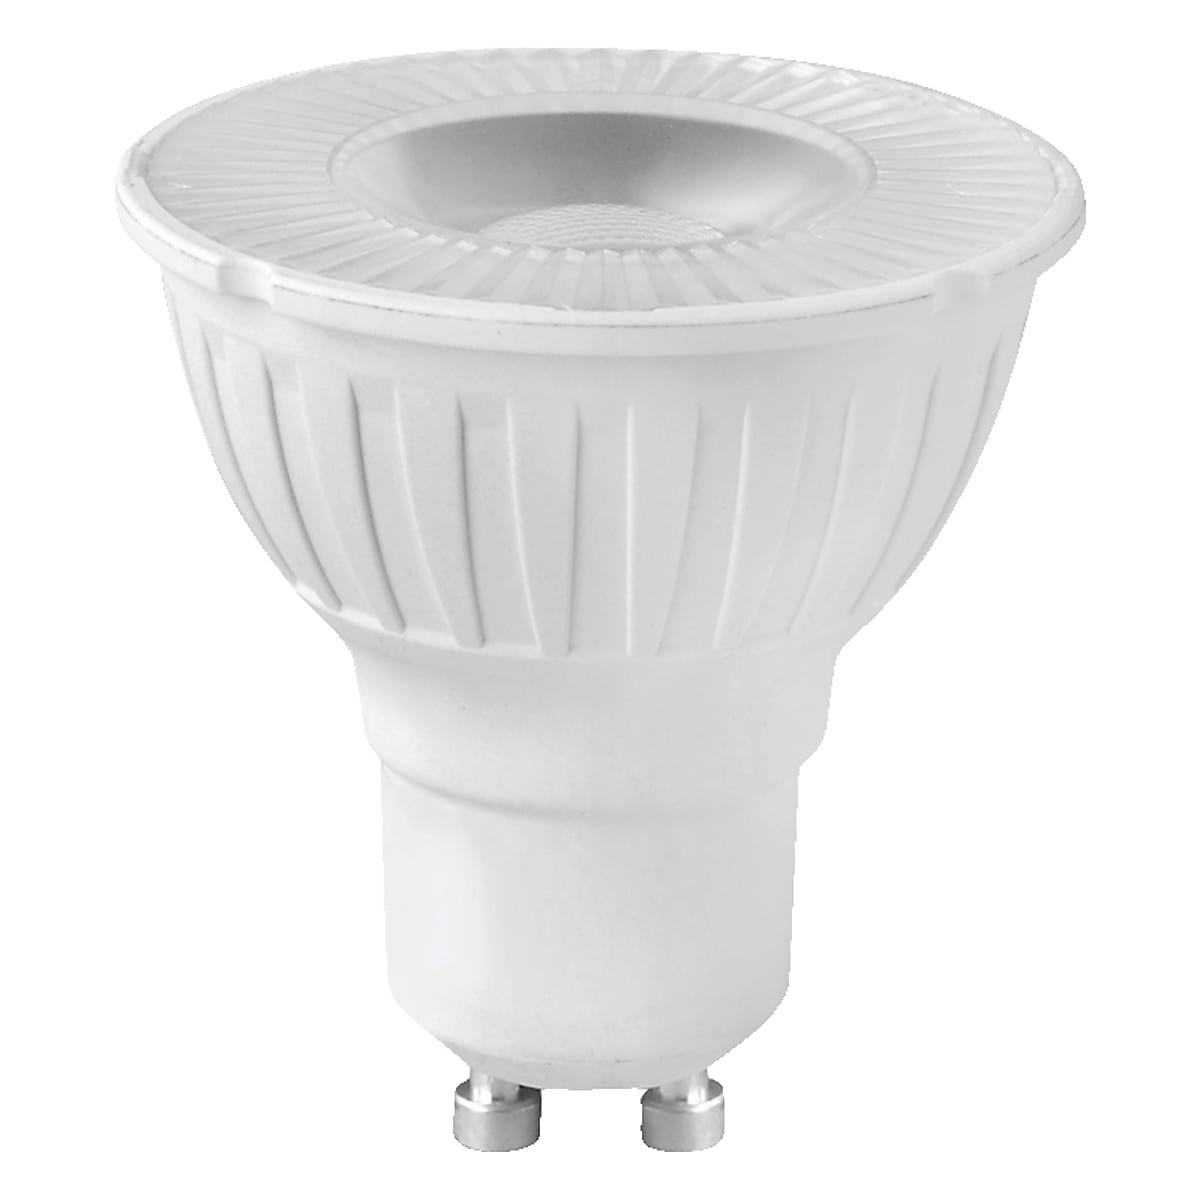 LED-lamppu GU10 Clas Ohlson 2 kpl